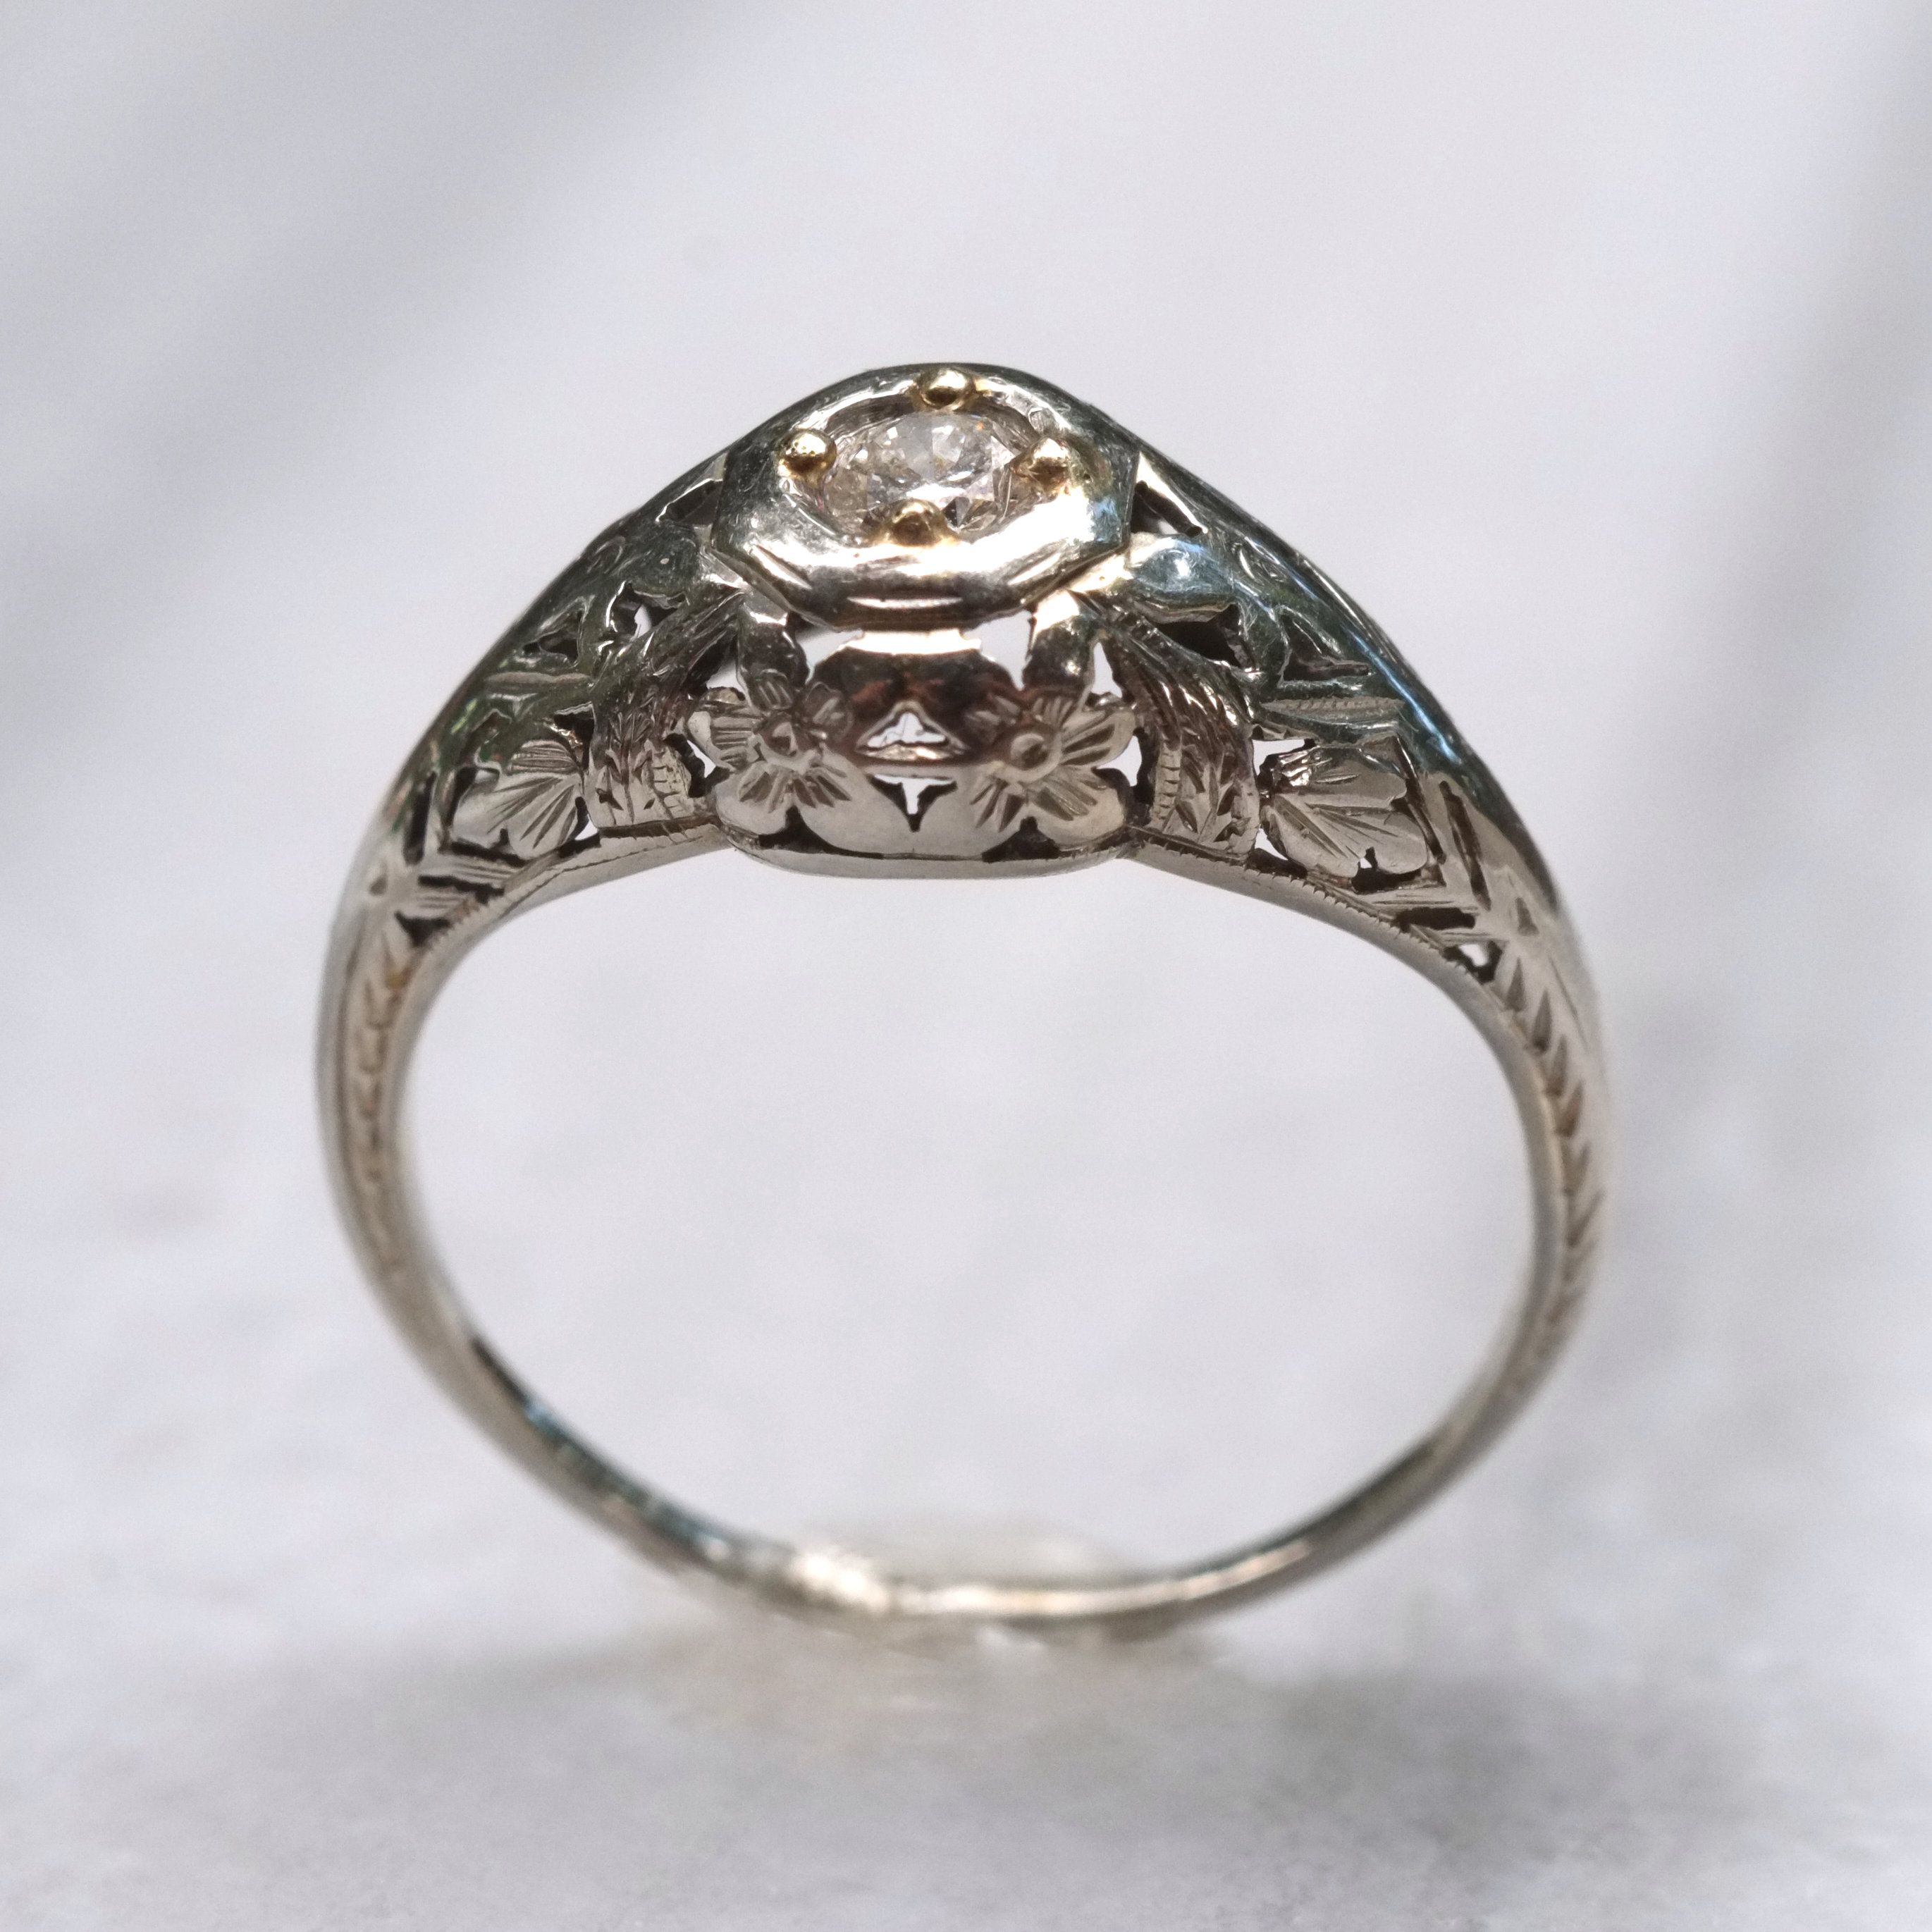 Edwardian White Gold Engagement Ring The Antiquarian